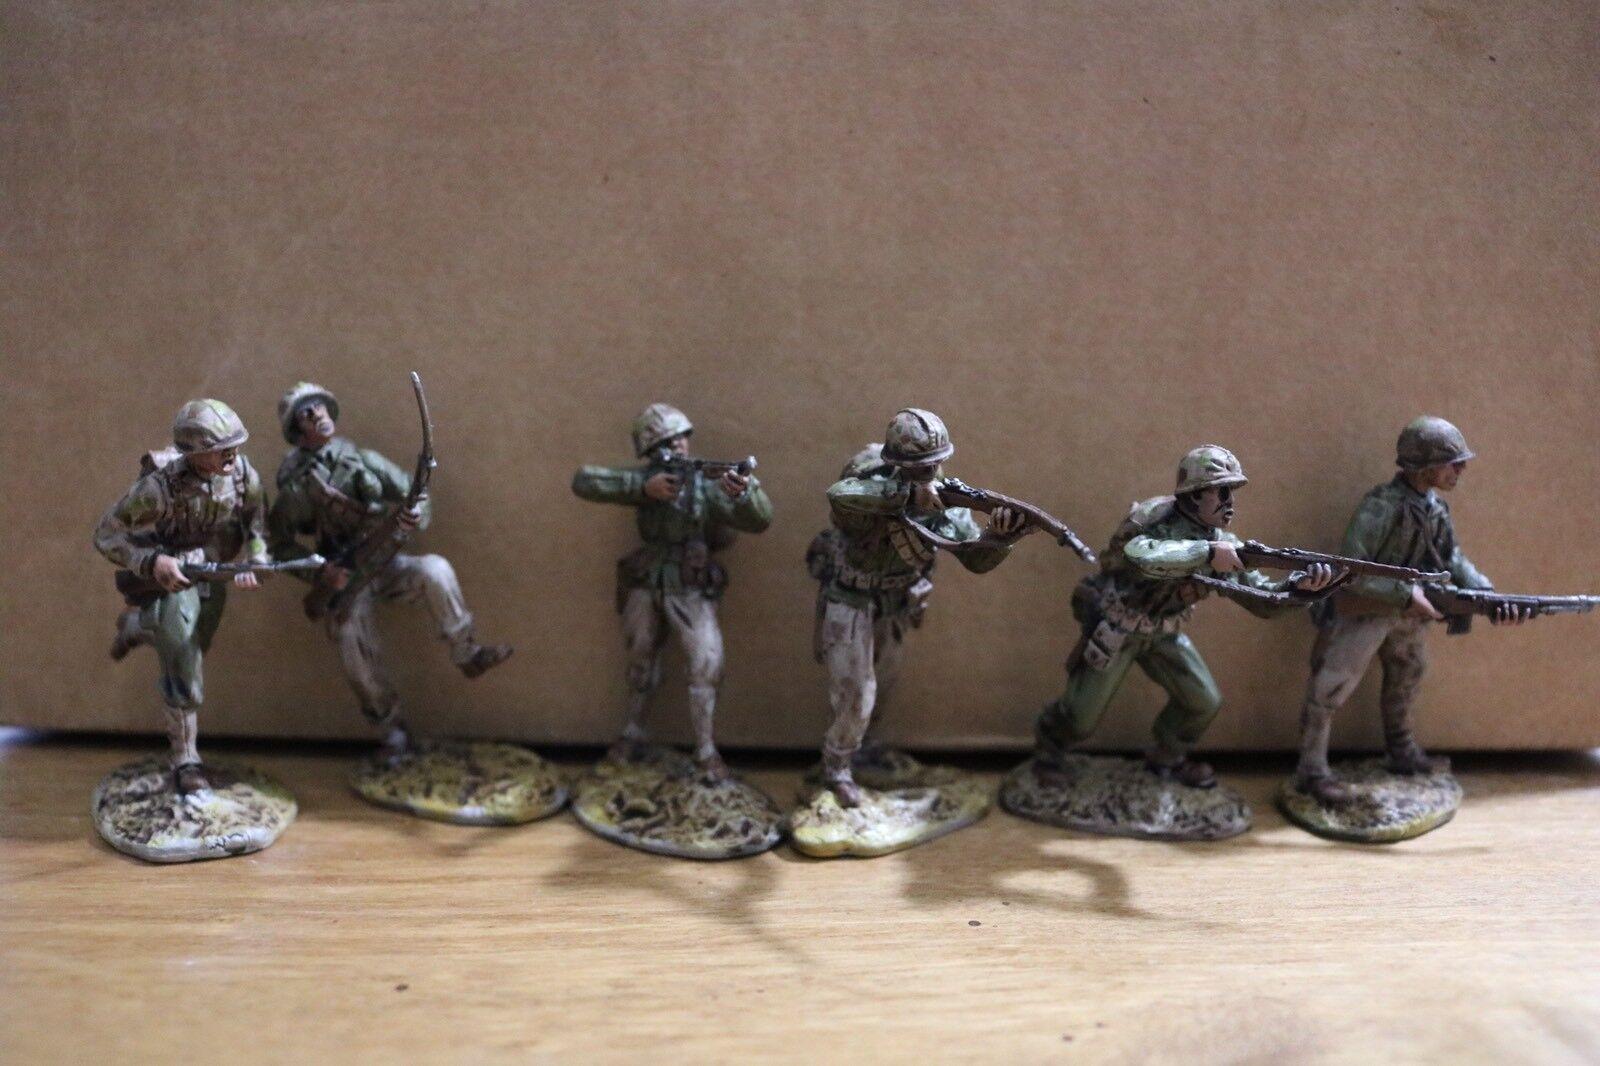 vendita outlet Well Painted plastic World War 2 cifras marines Squad Squad Squad  ordina ora i prezzi più bassi